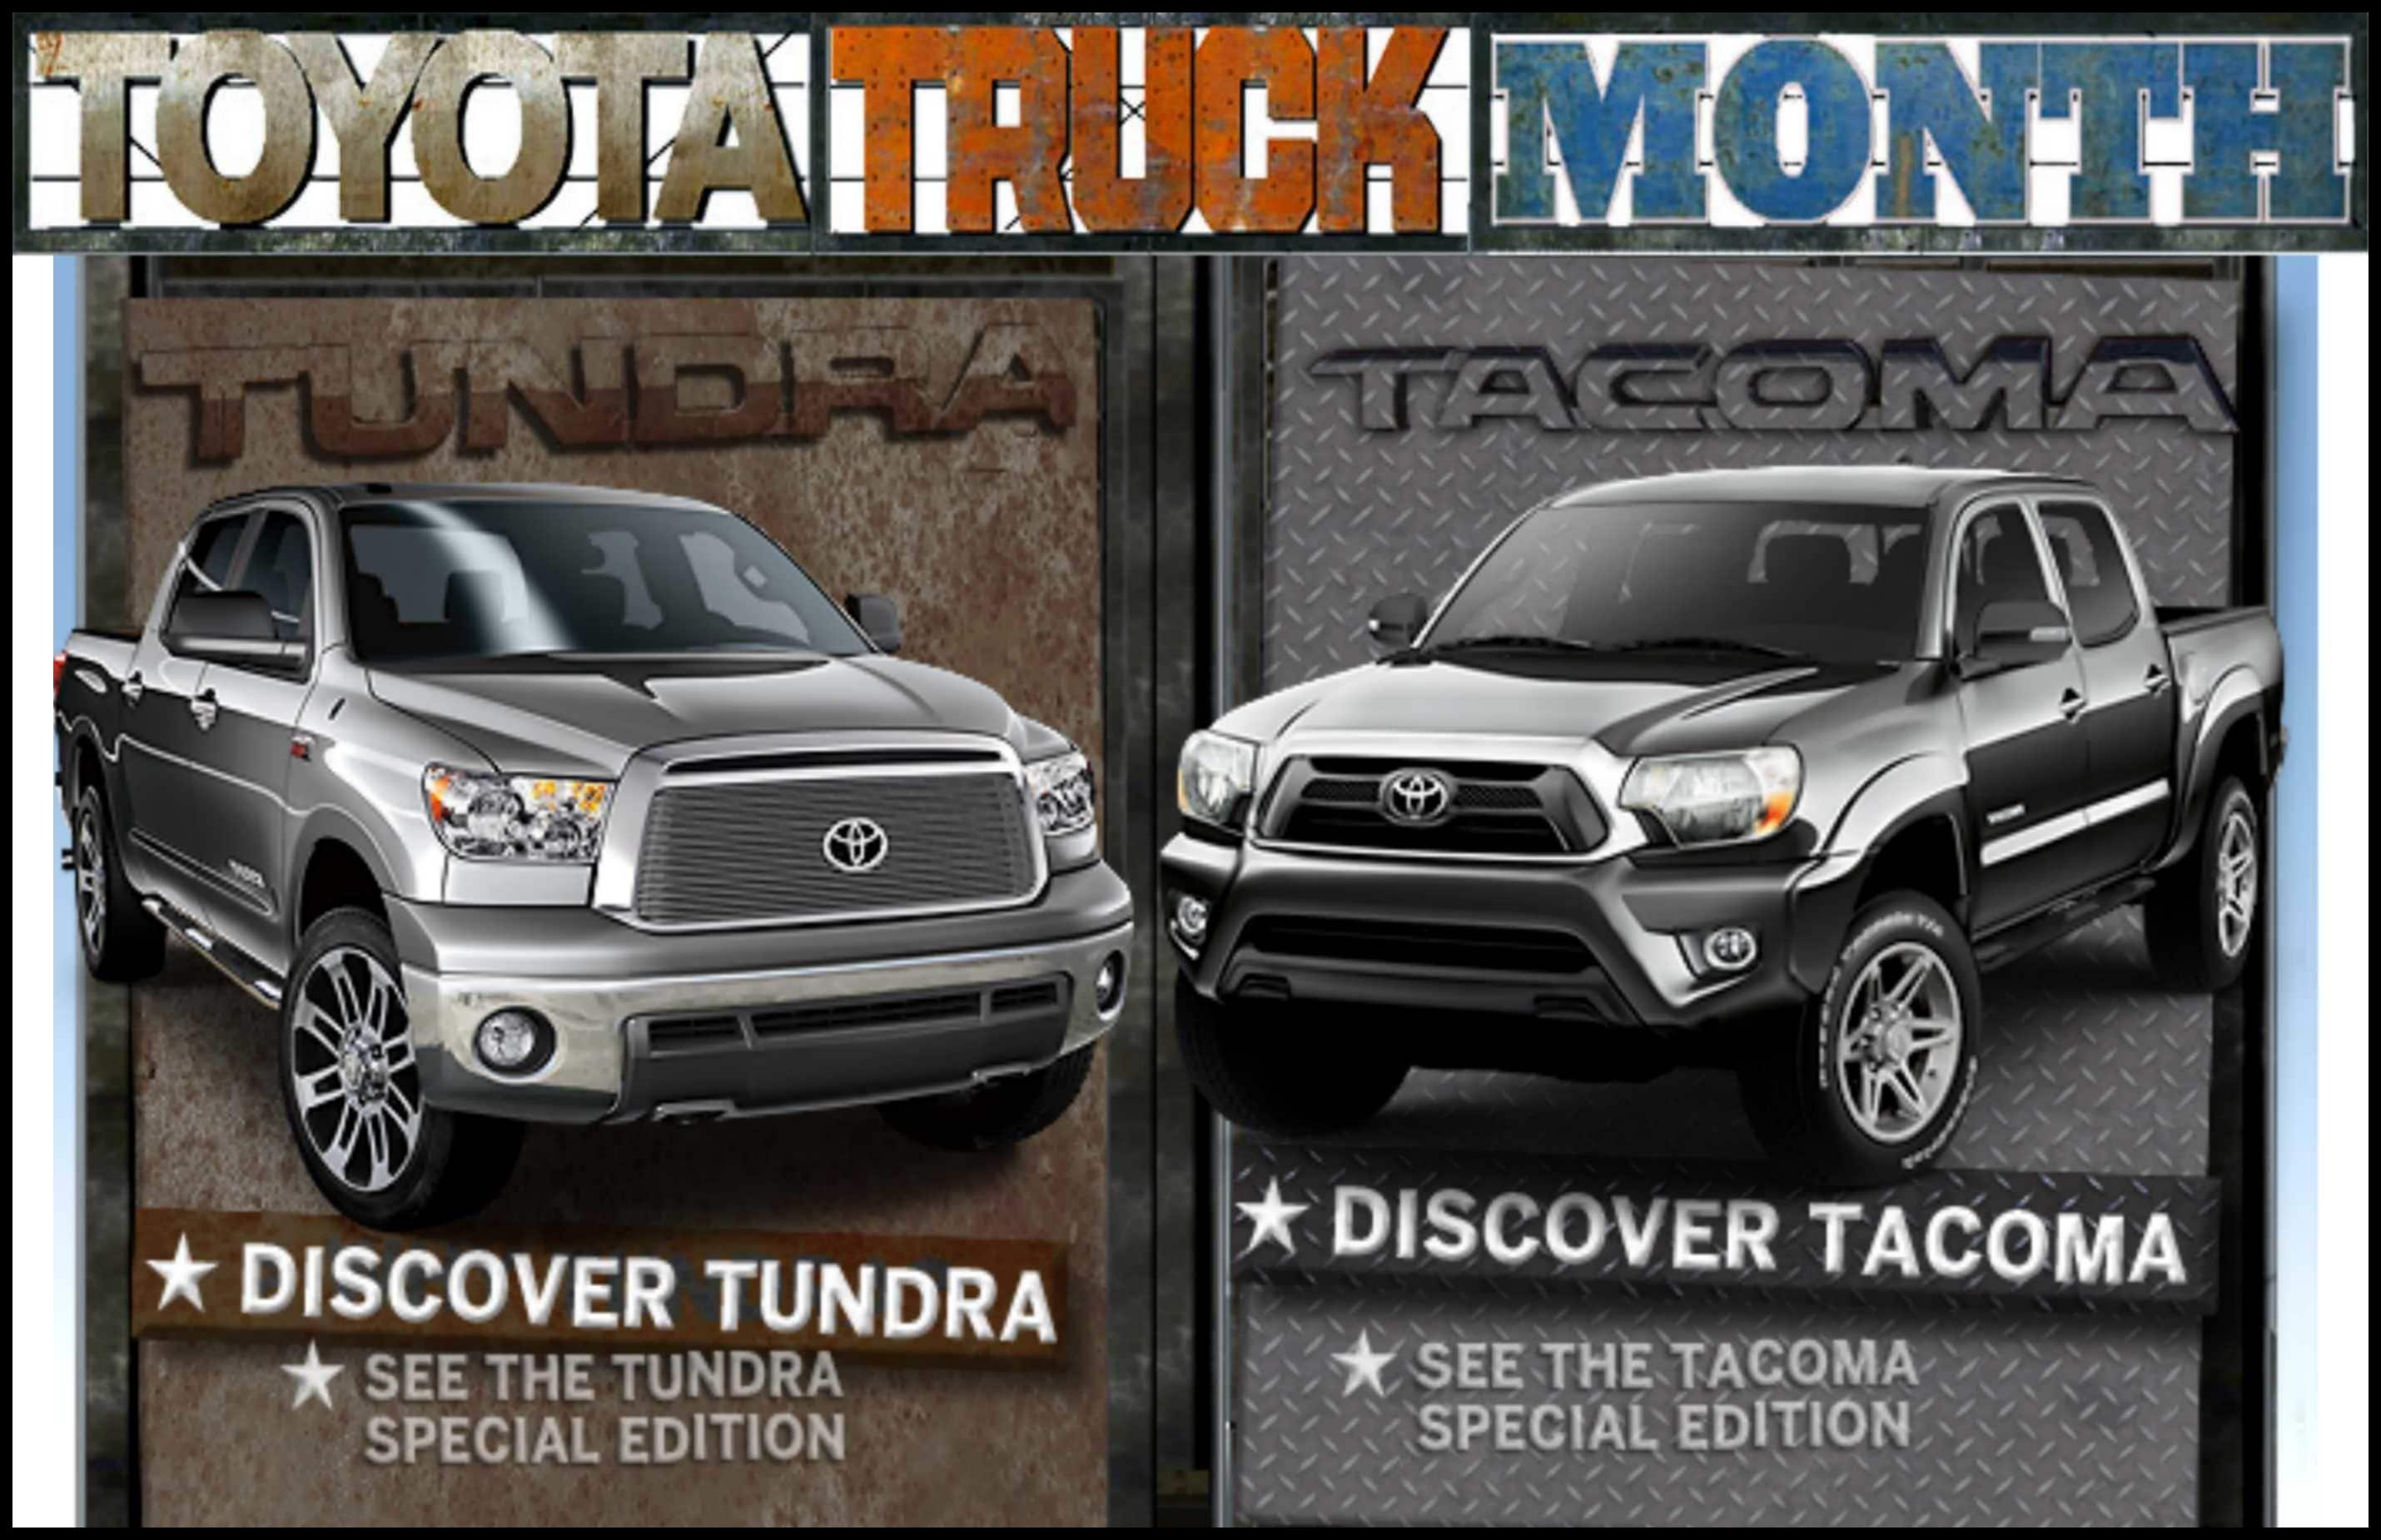 Toyota Truck Month Canton MI